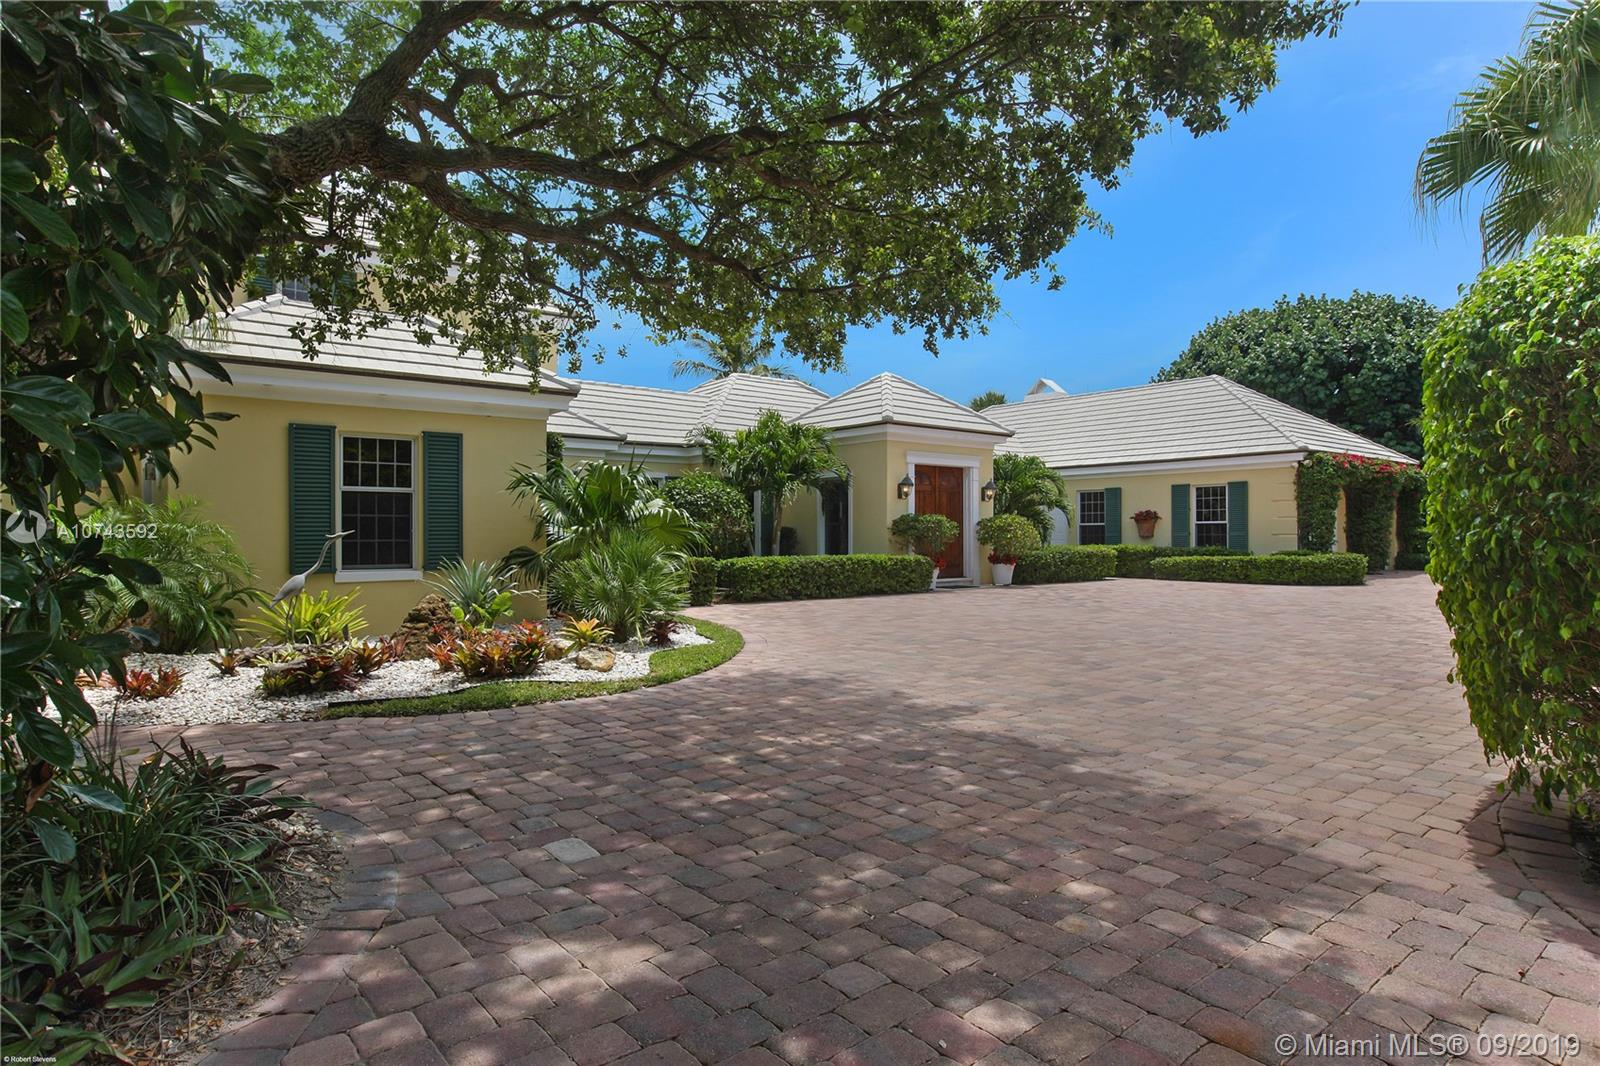 123 Gomez Rd, Hobe Sound, Florida